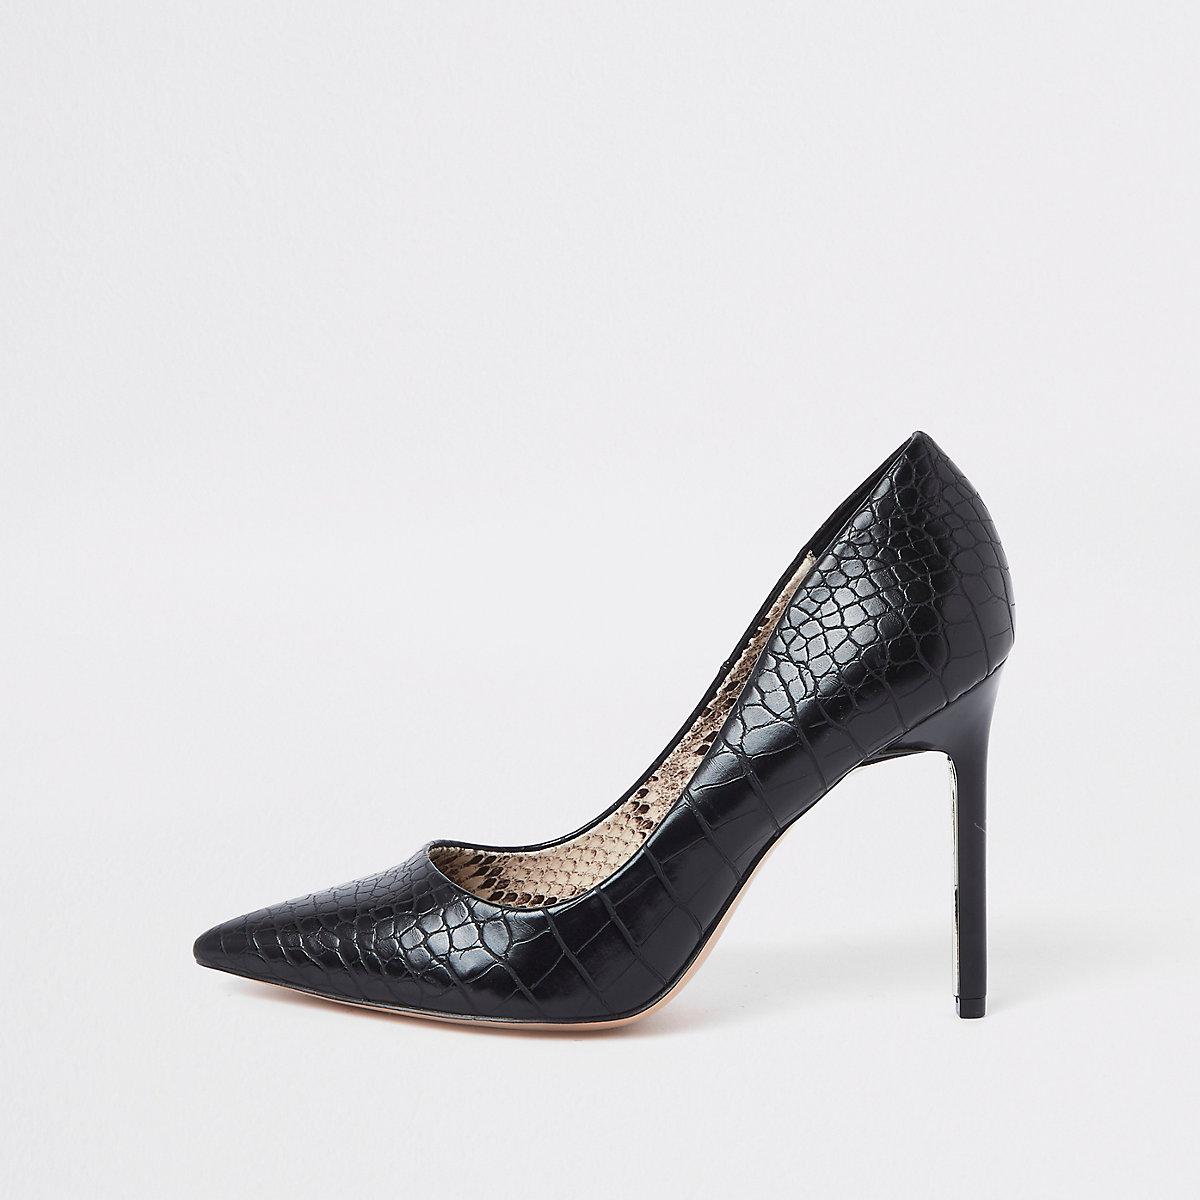 Black croc embossed wide fit pumps